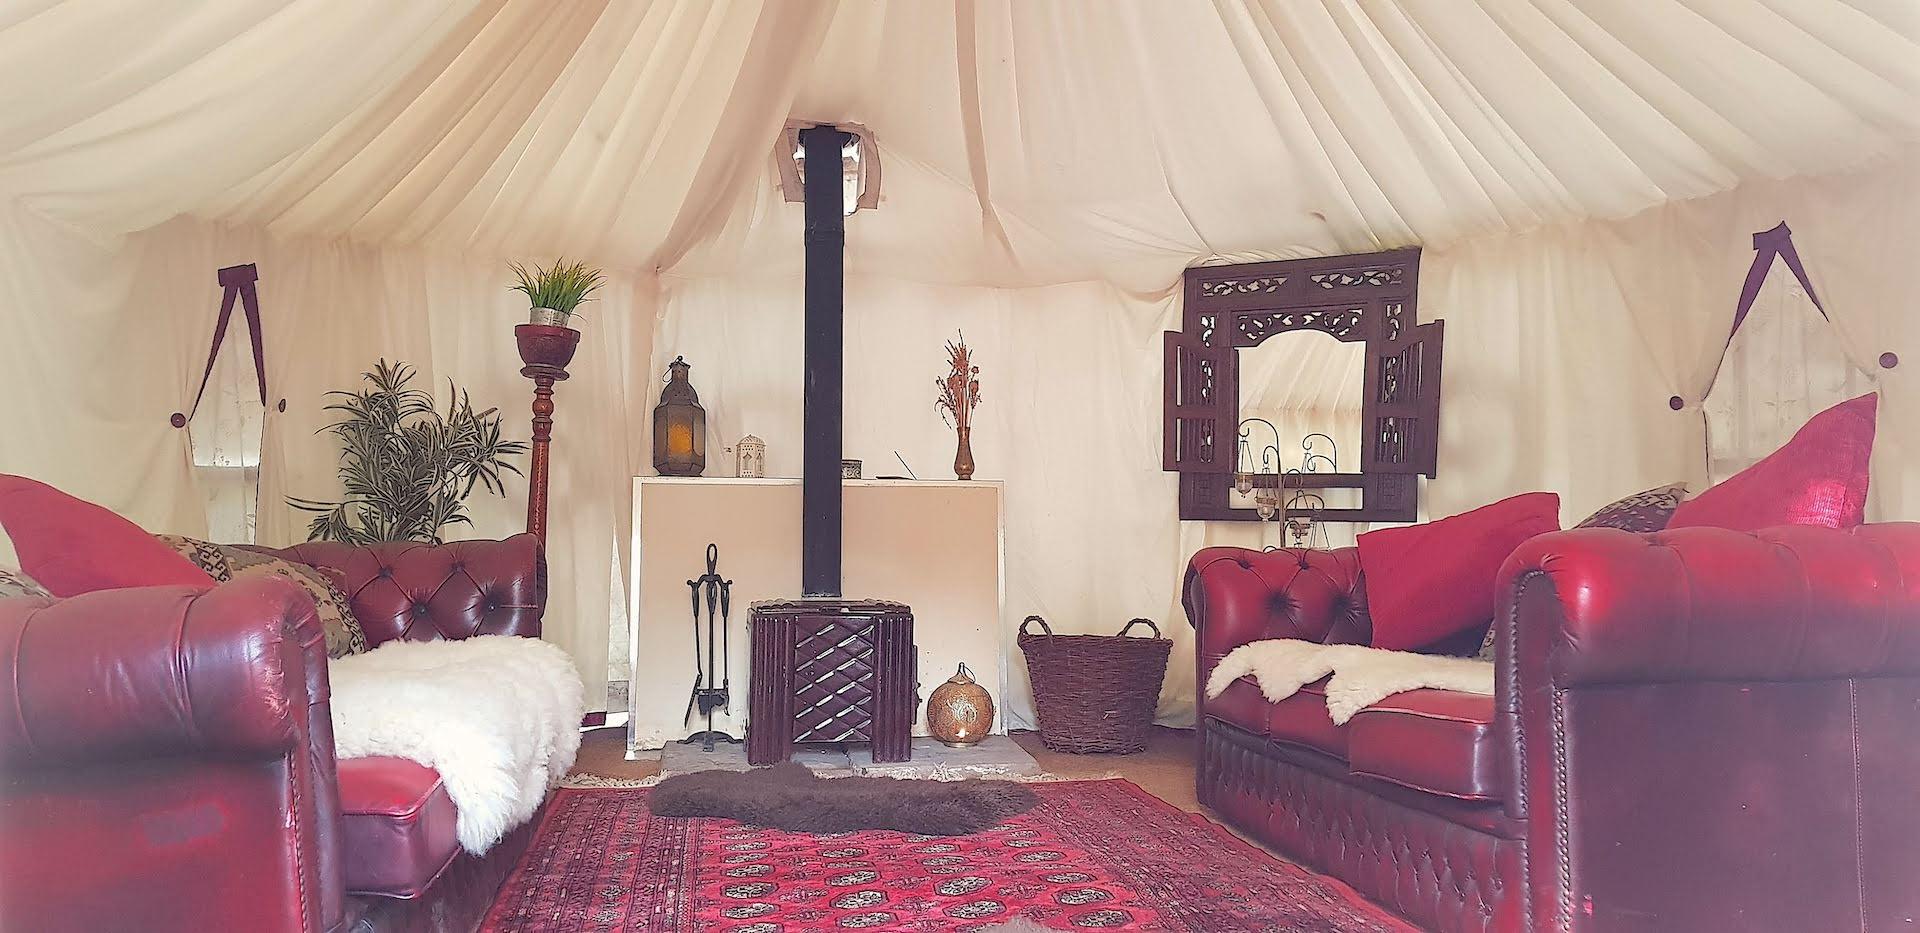 Plush Tents Yurt Hire Lounge Green Room